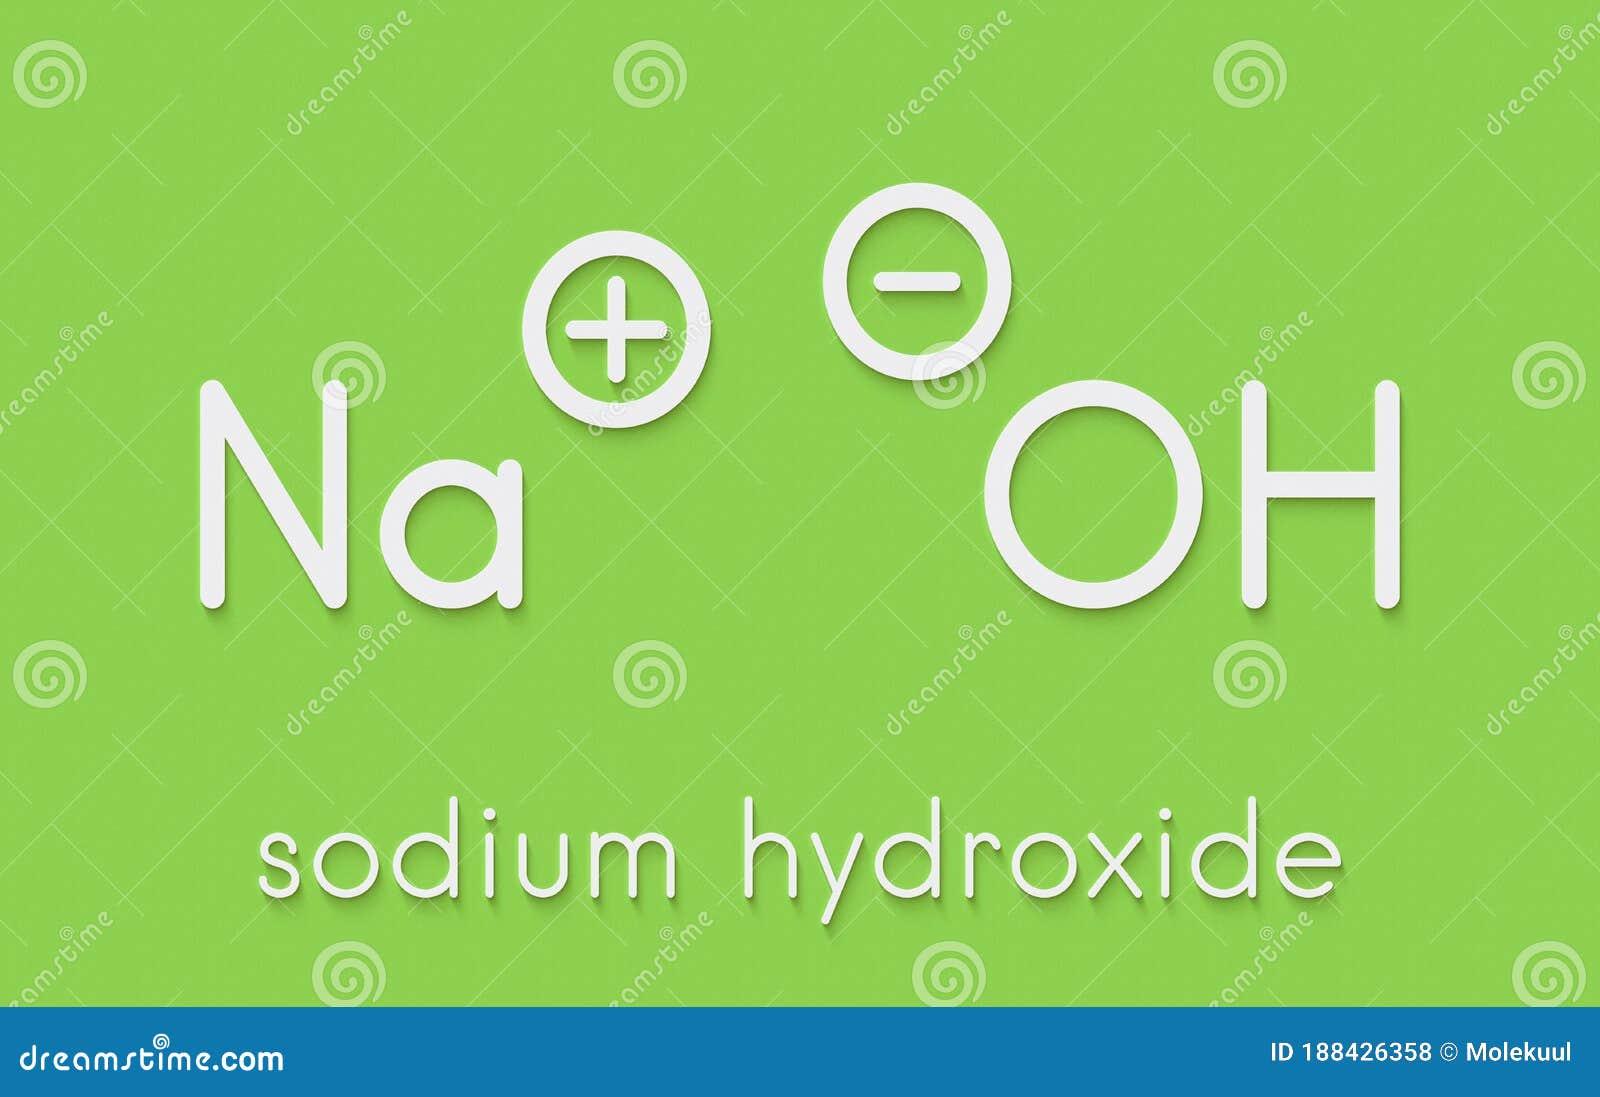 Sodium Hydroxide Lye, Caustic Soda, Chemical Structure ...